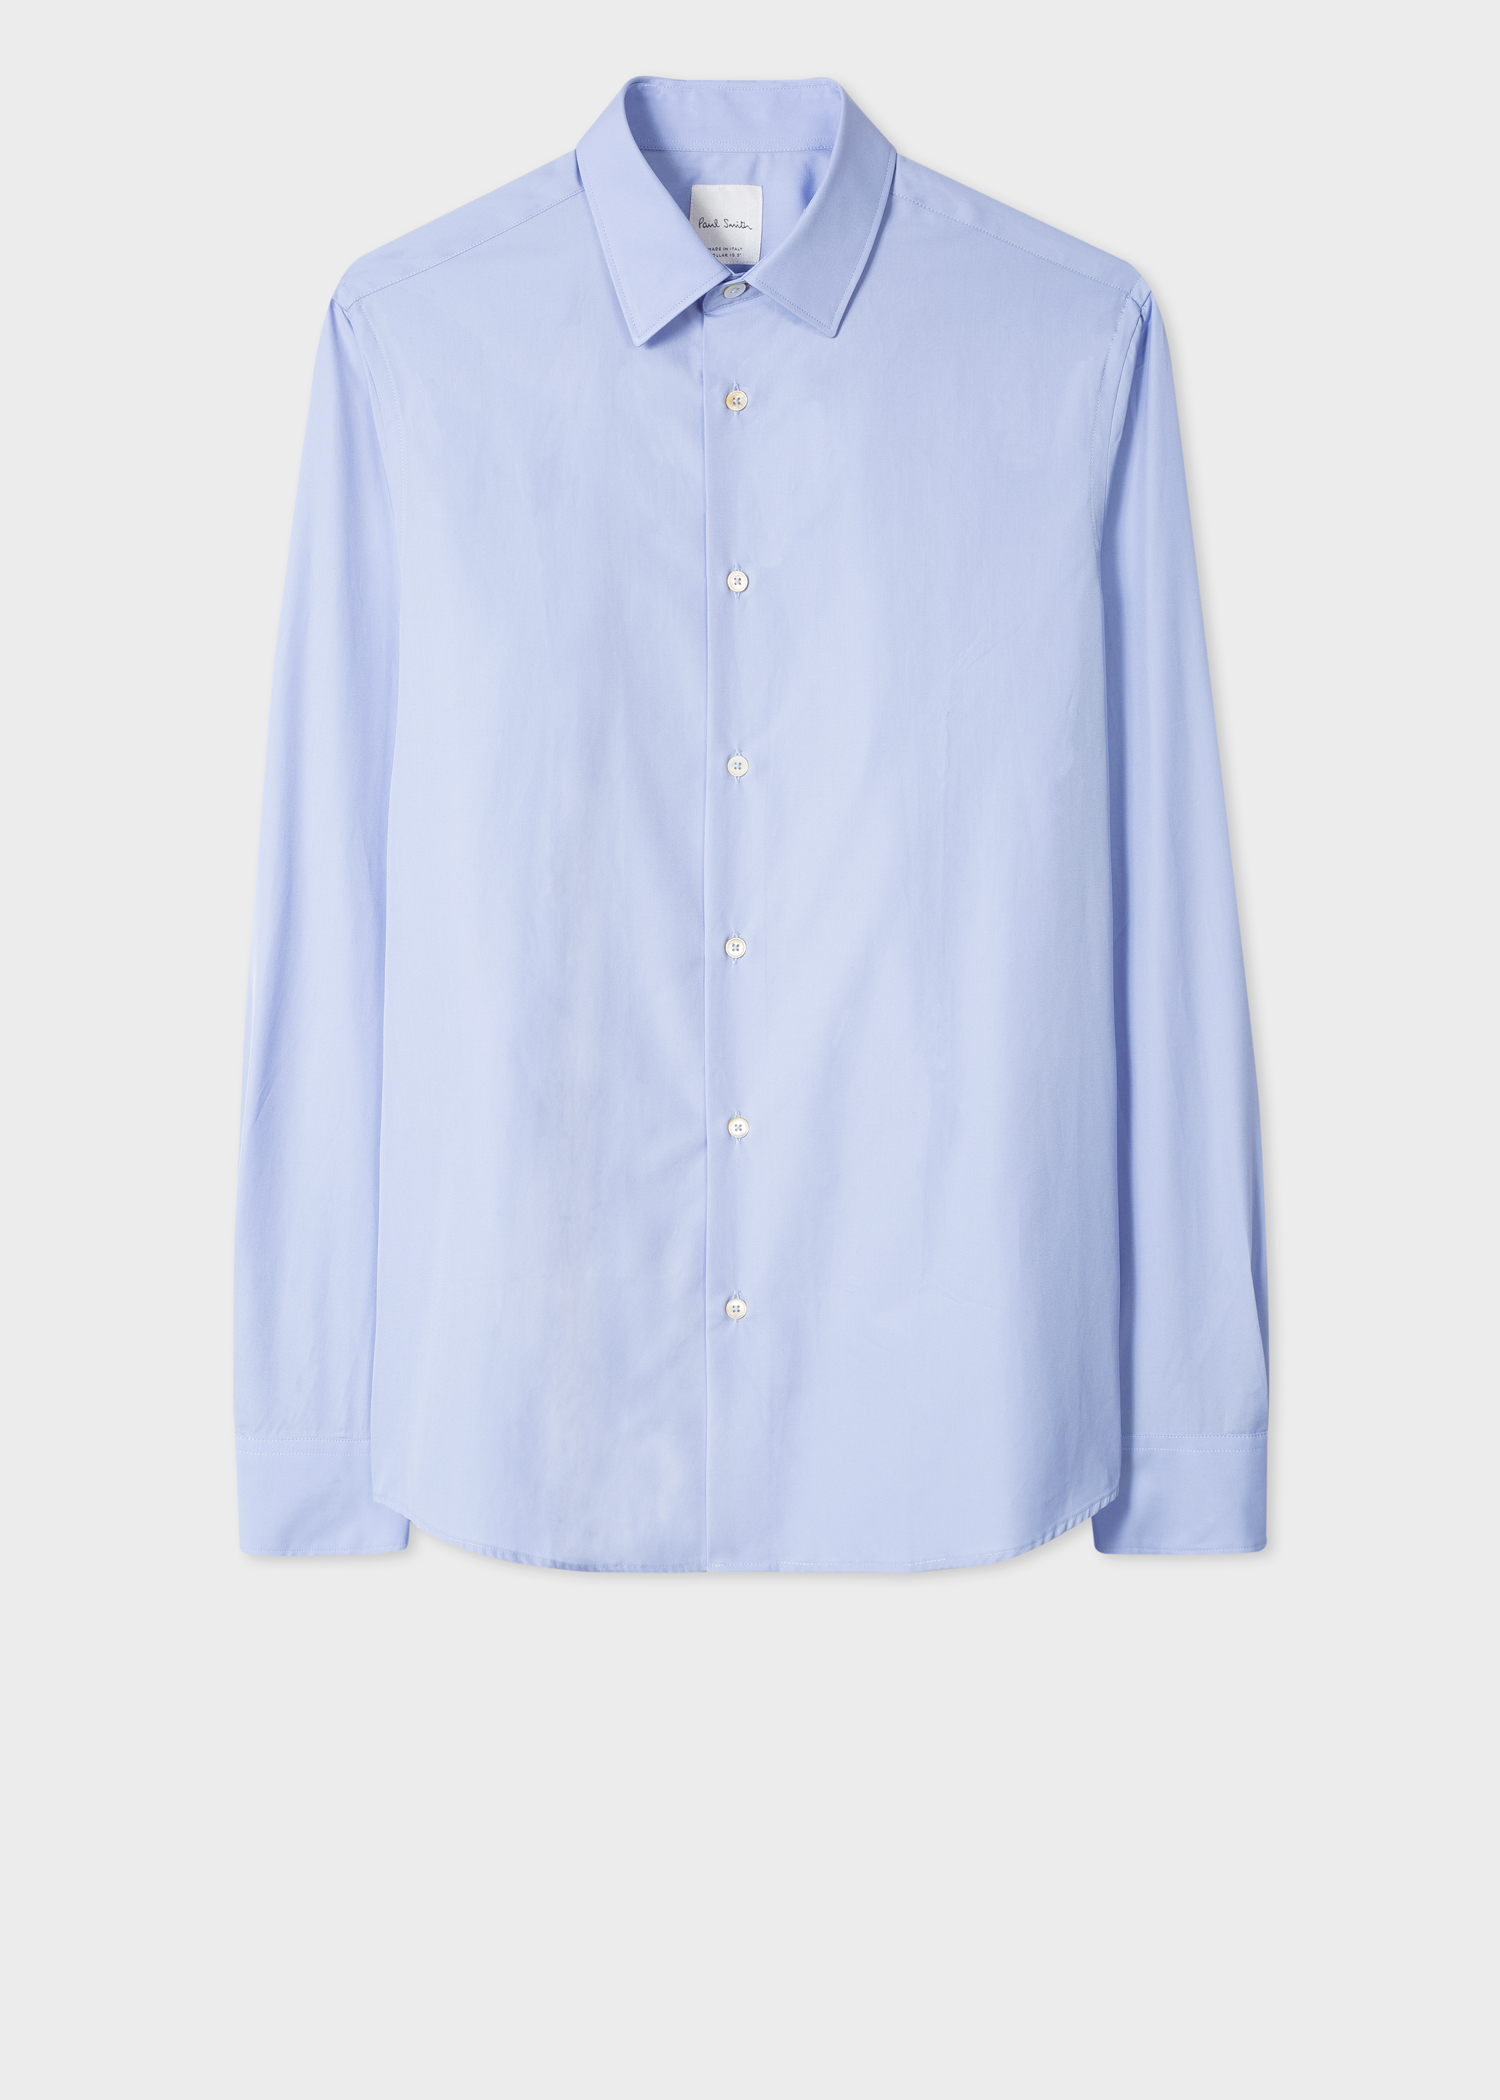 4d54abc17 Front view - Men's Tailored-Fit Sky Blue Cotton Shirt With 'Signature  Stripe'